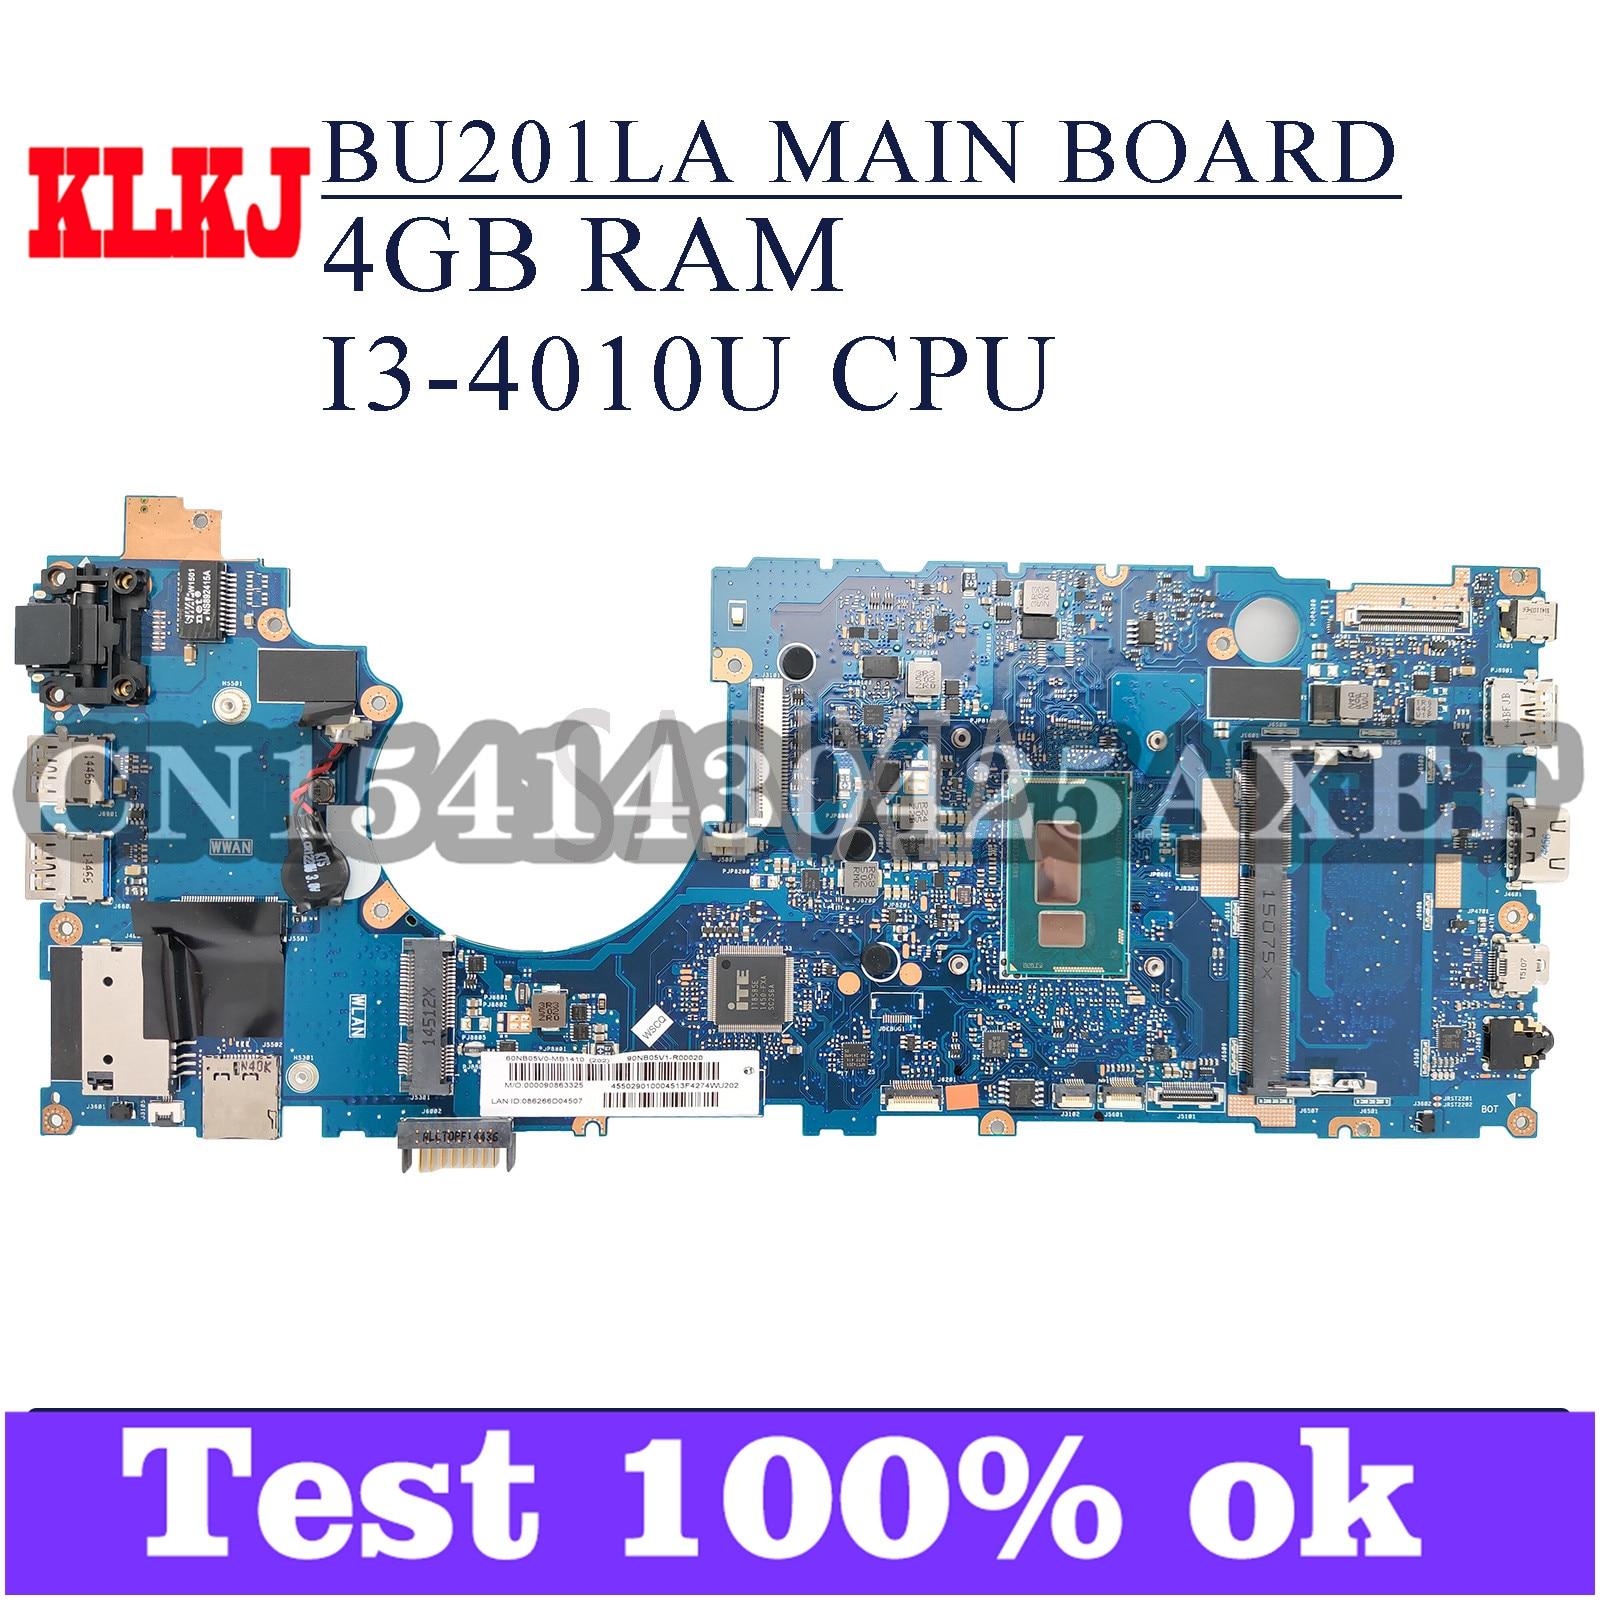 KLKJ BU201LA اللوحة الأم لأجهزة الكمبيوتر المحمول ASUS BU201LA BU201L اللوحة الرئيسية الأصلية 4GB-RAM I3-4010U